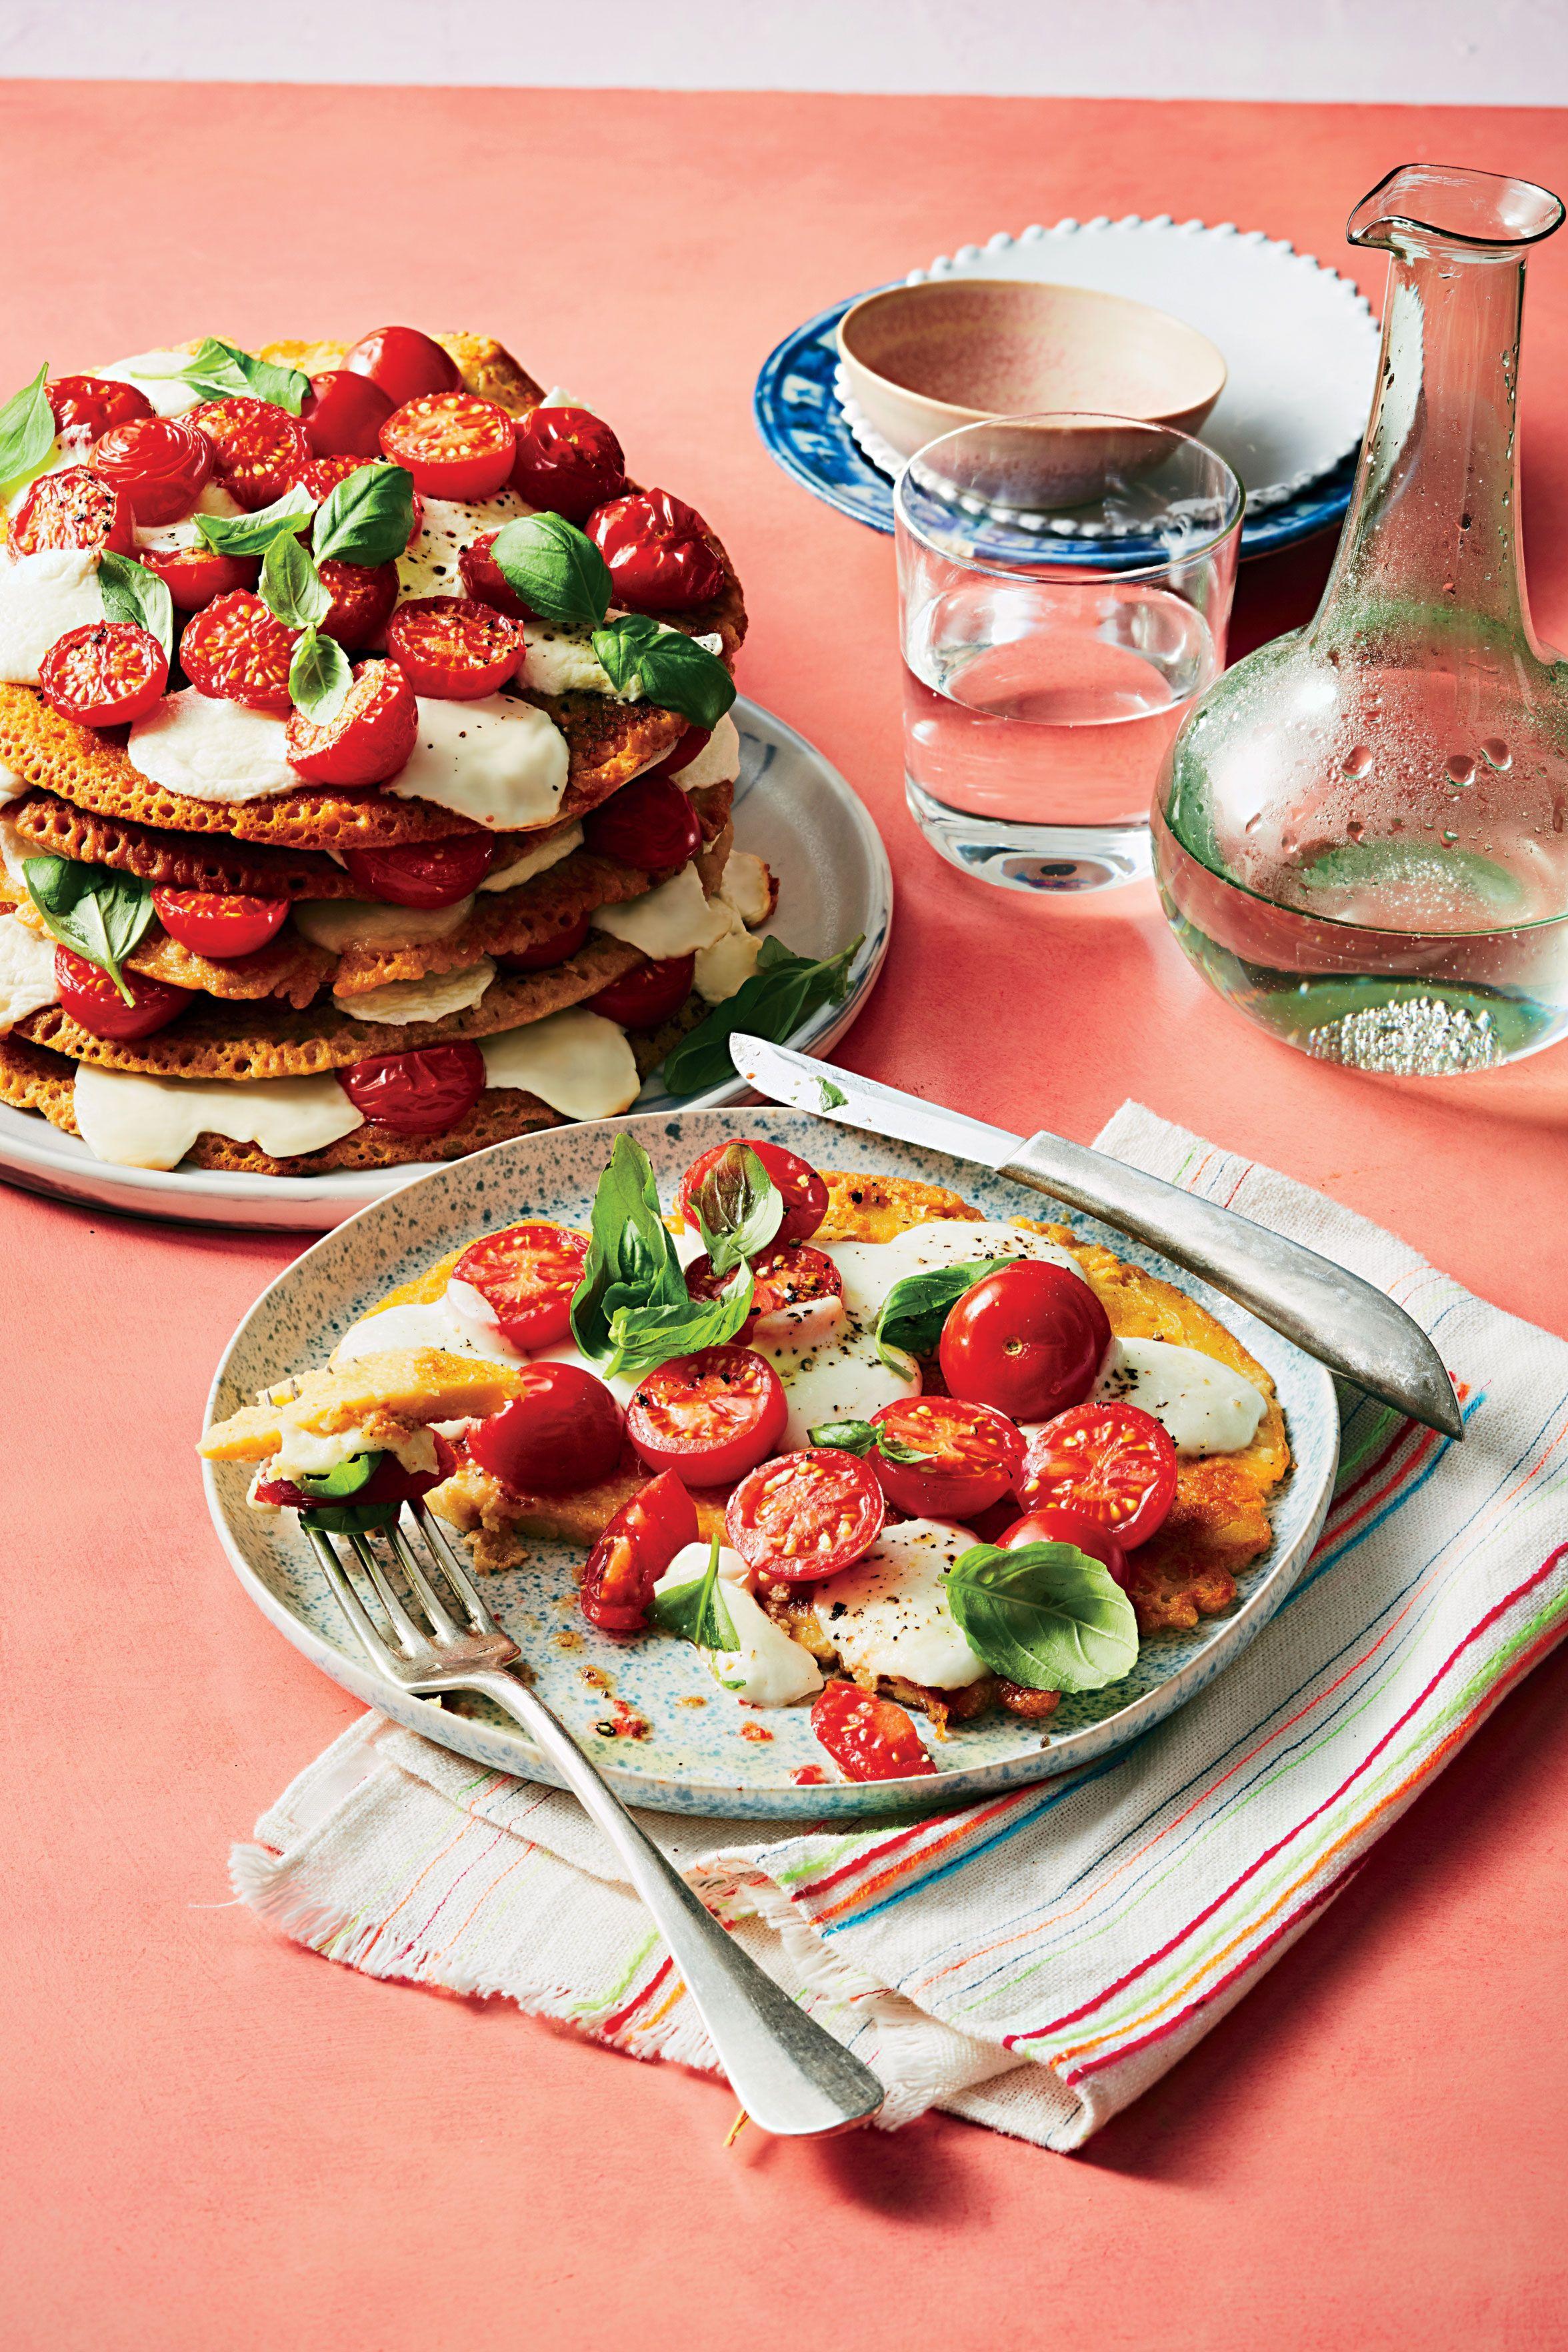 Socca french flatbread pancake